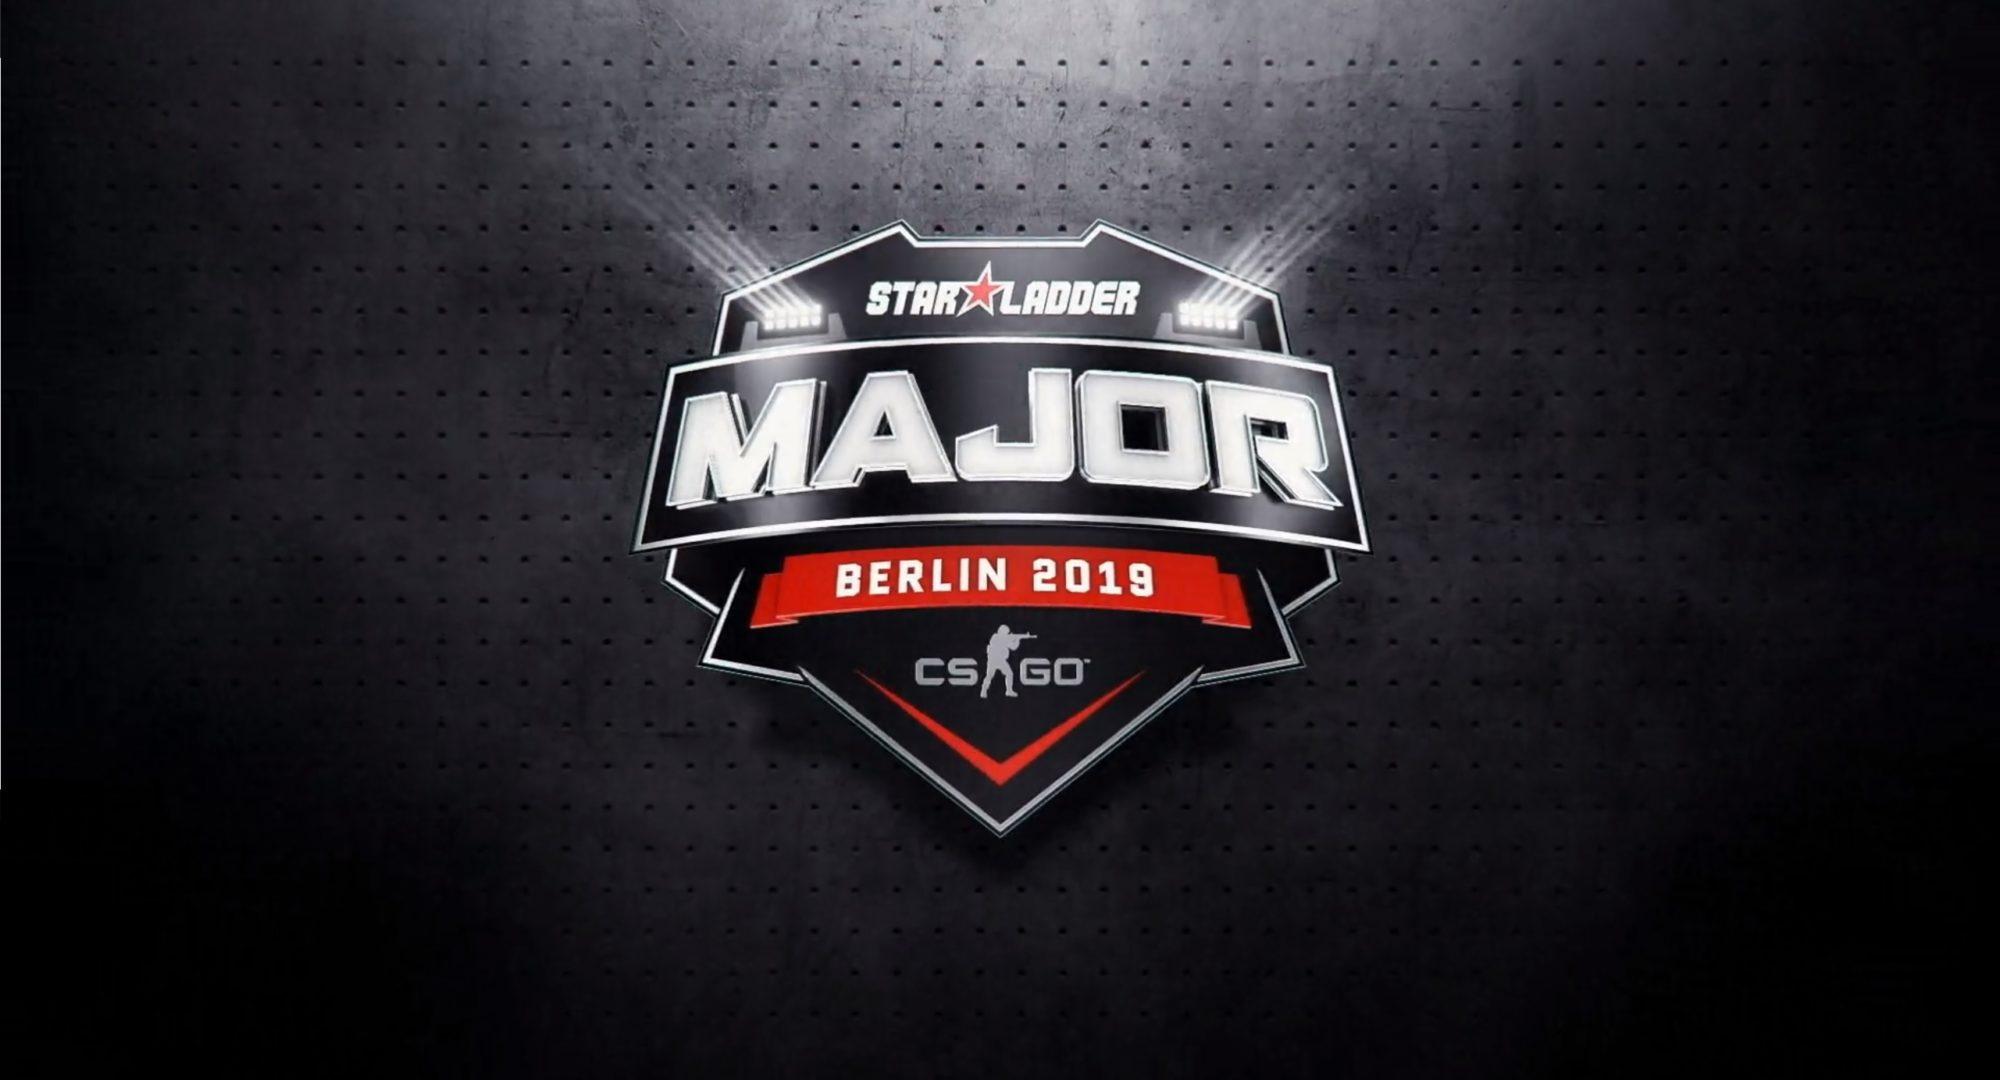 csgo major berlin